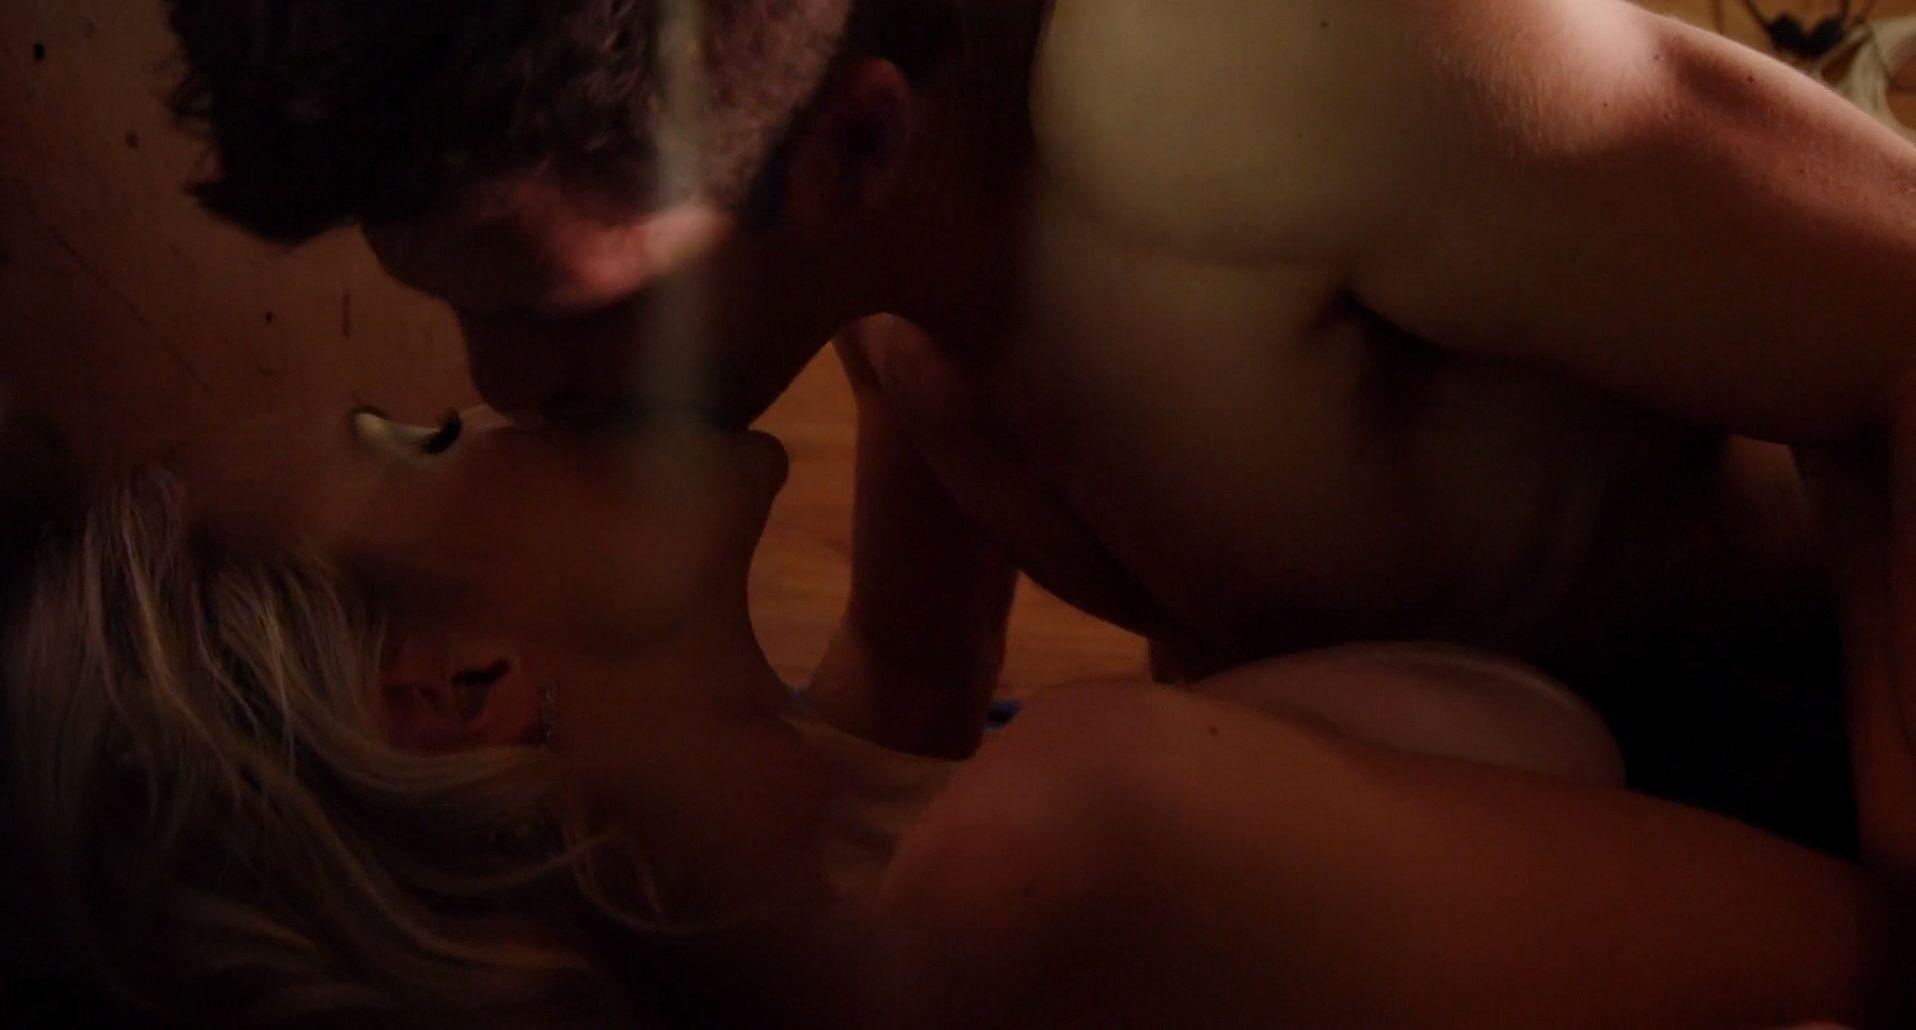 Alicia-Ancel-Nude-1